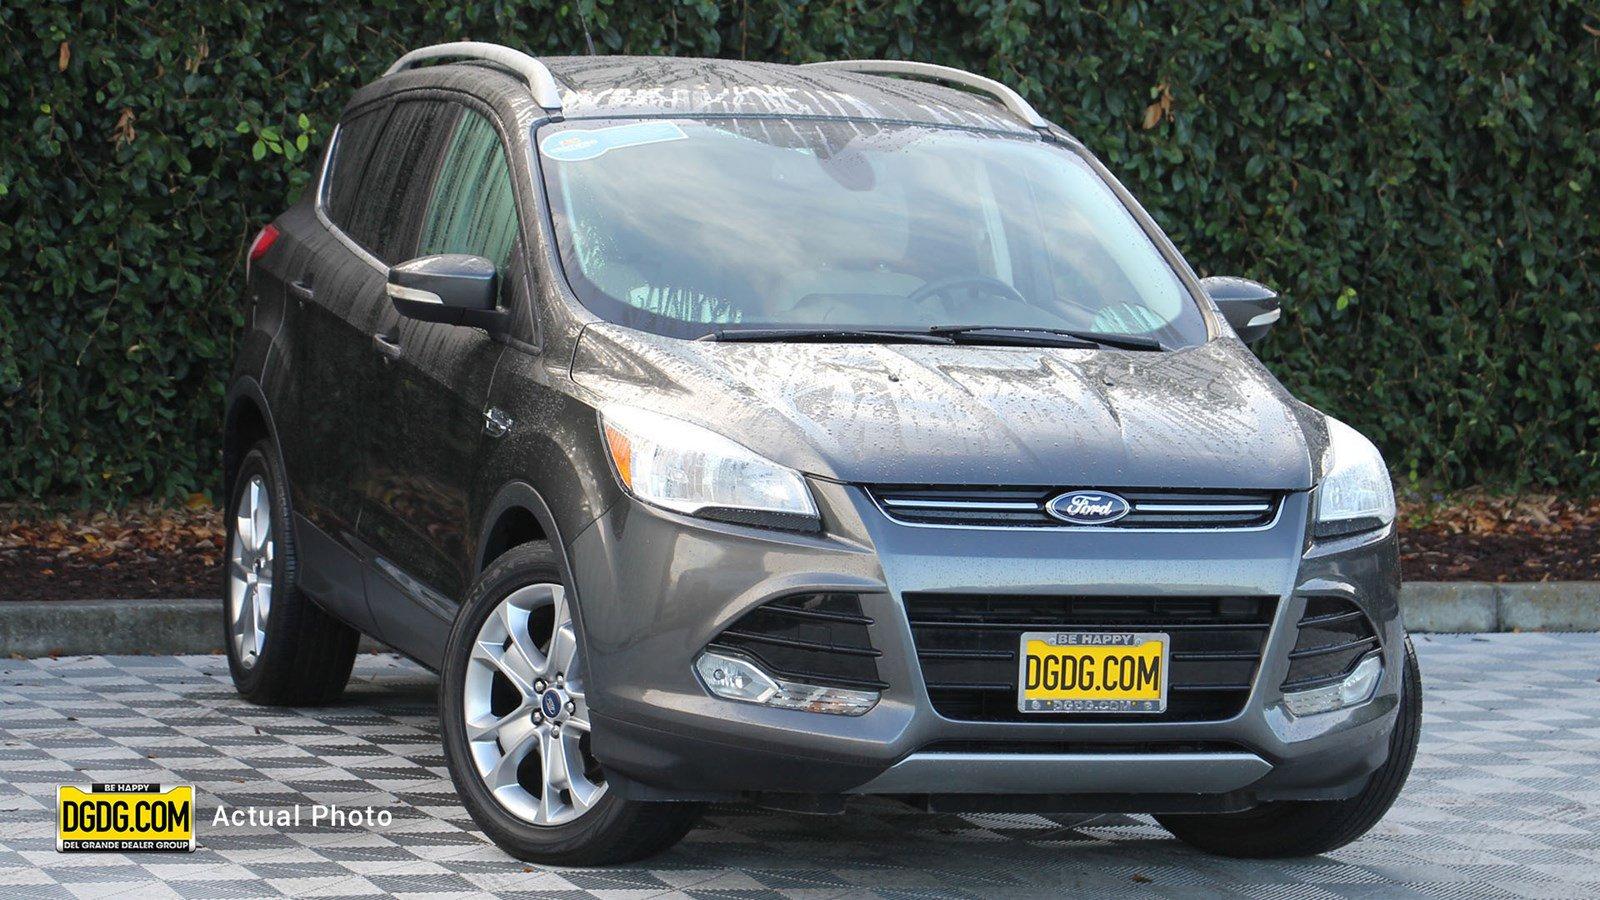 "2015 Ford<br/><span class=""vdp-trim"">Escape Titanium FWD 4D Sport Utility</span>"